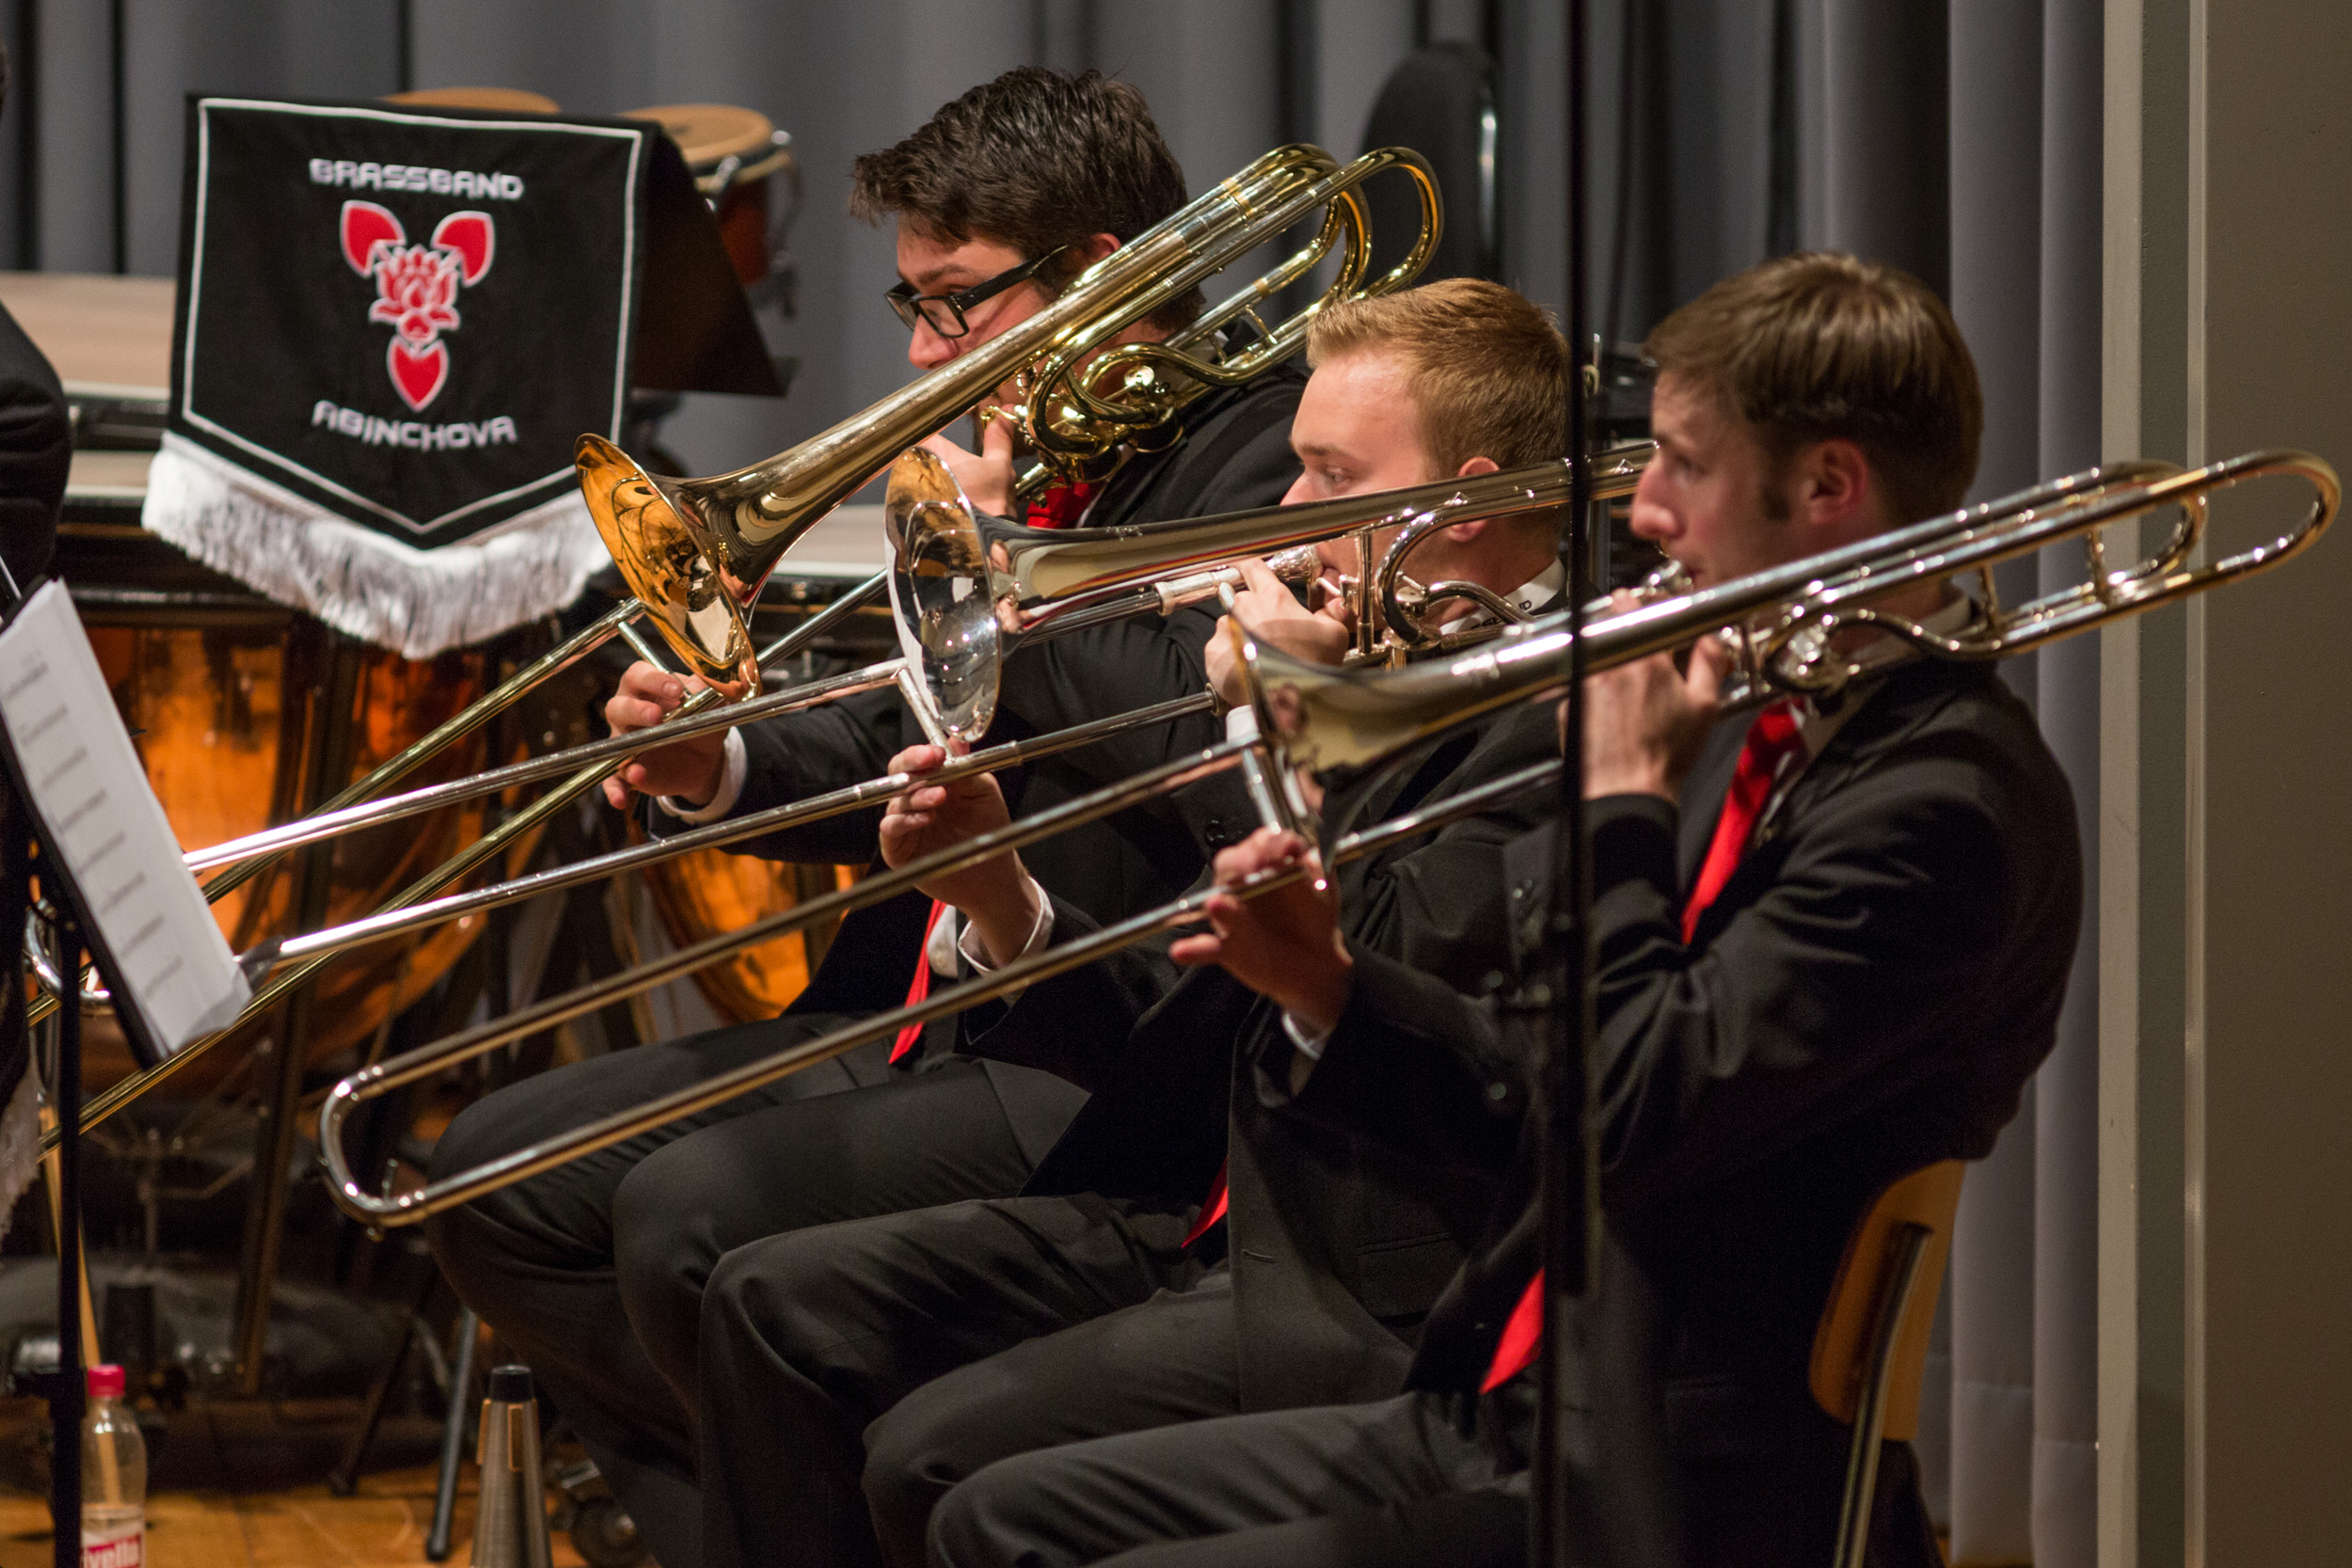 20160521_Brassband Abinchova_Jubila¦êumskonzert im Pfarreiheim in Ebikon_17.jpg